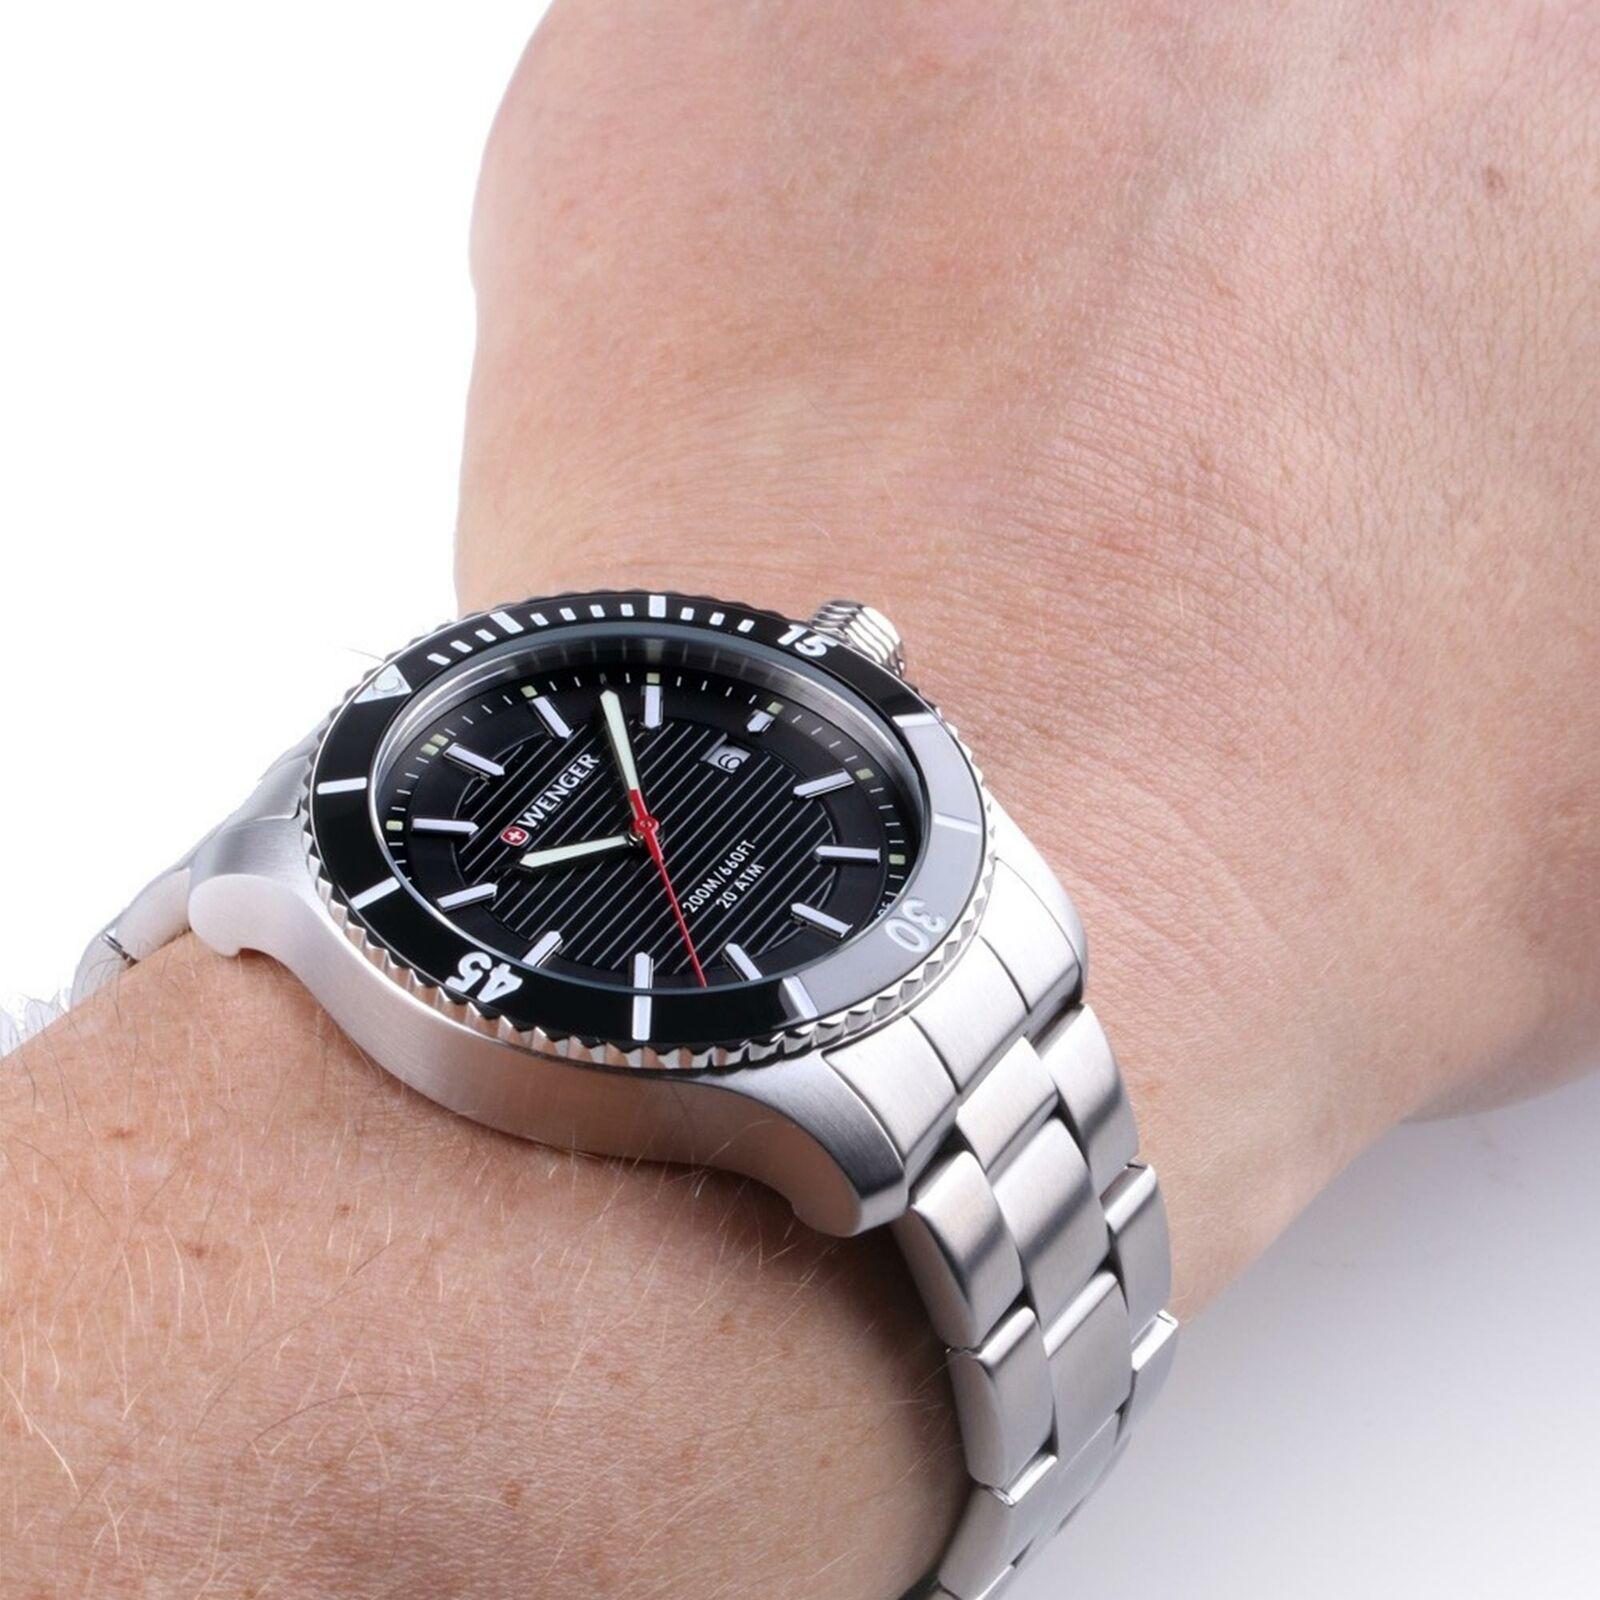 Relógio Wenger Masculino preto - Seaforce - 01.0641.118